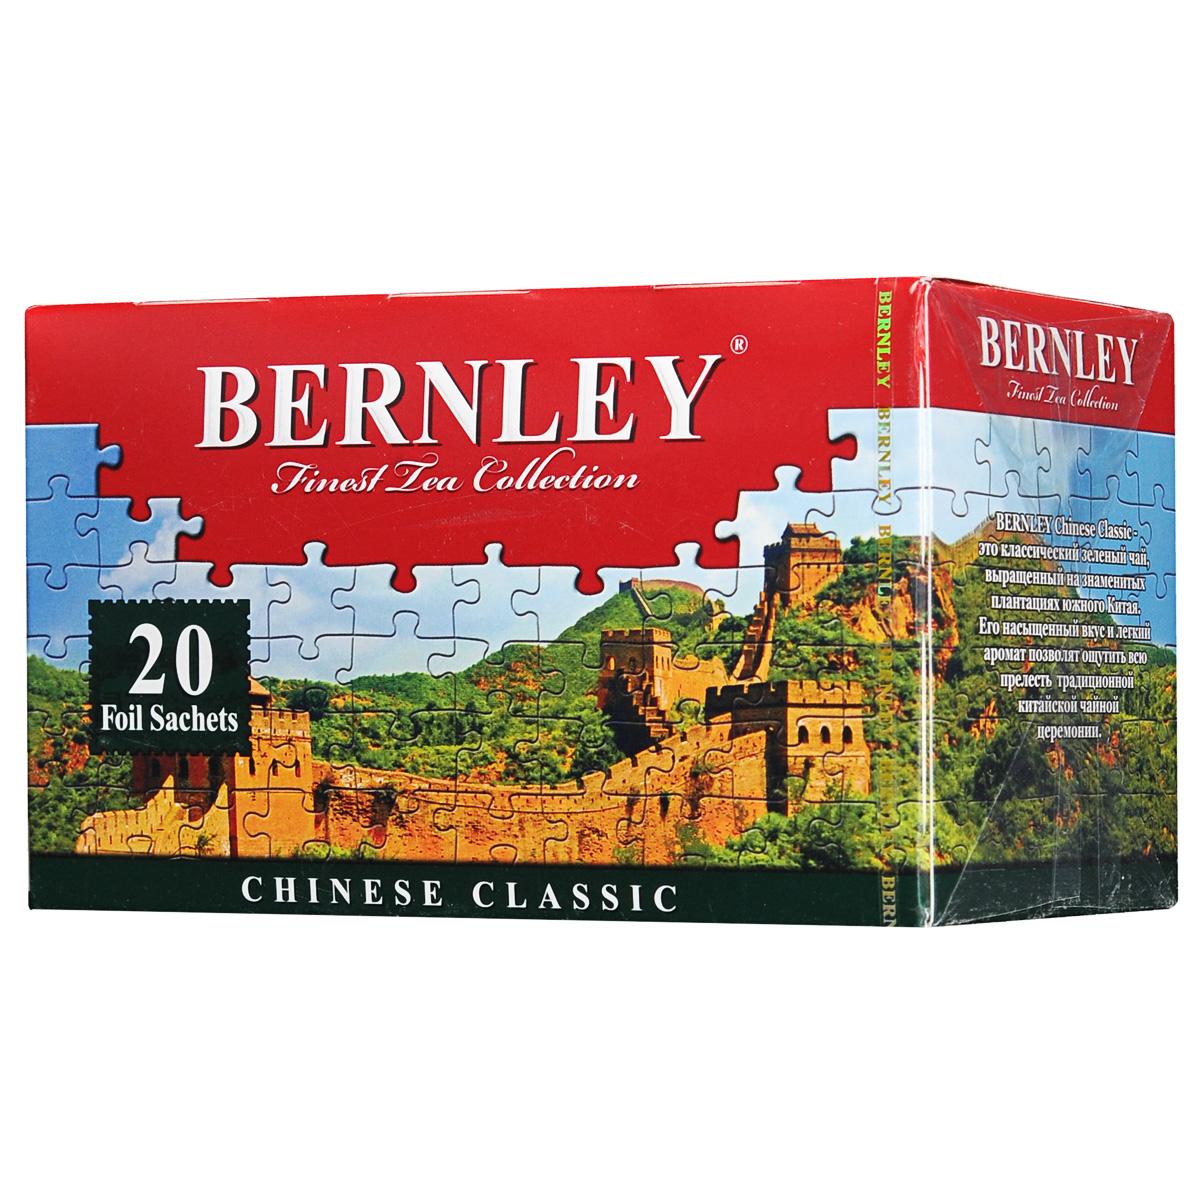 Bernley Chinese Classic зеленый чай в пакетиках, 20 шт